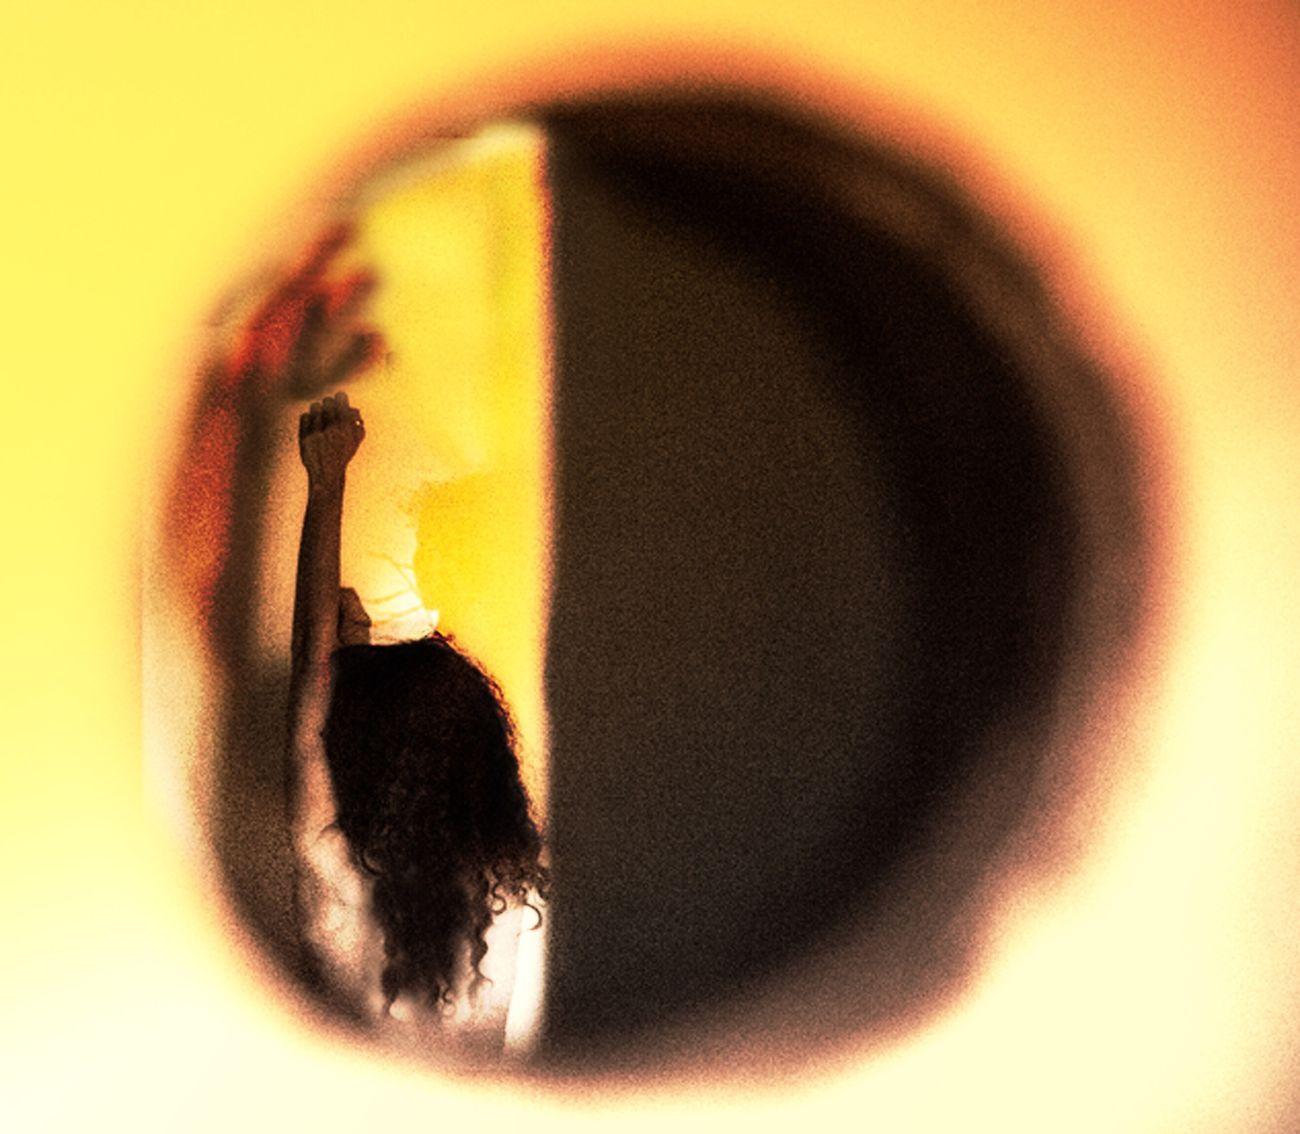 Stage fright Ginnaalvarez Ginna álvarez Spy Voyeur Peeking Selfportrait That's Me Mexican Back Stretch